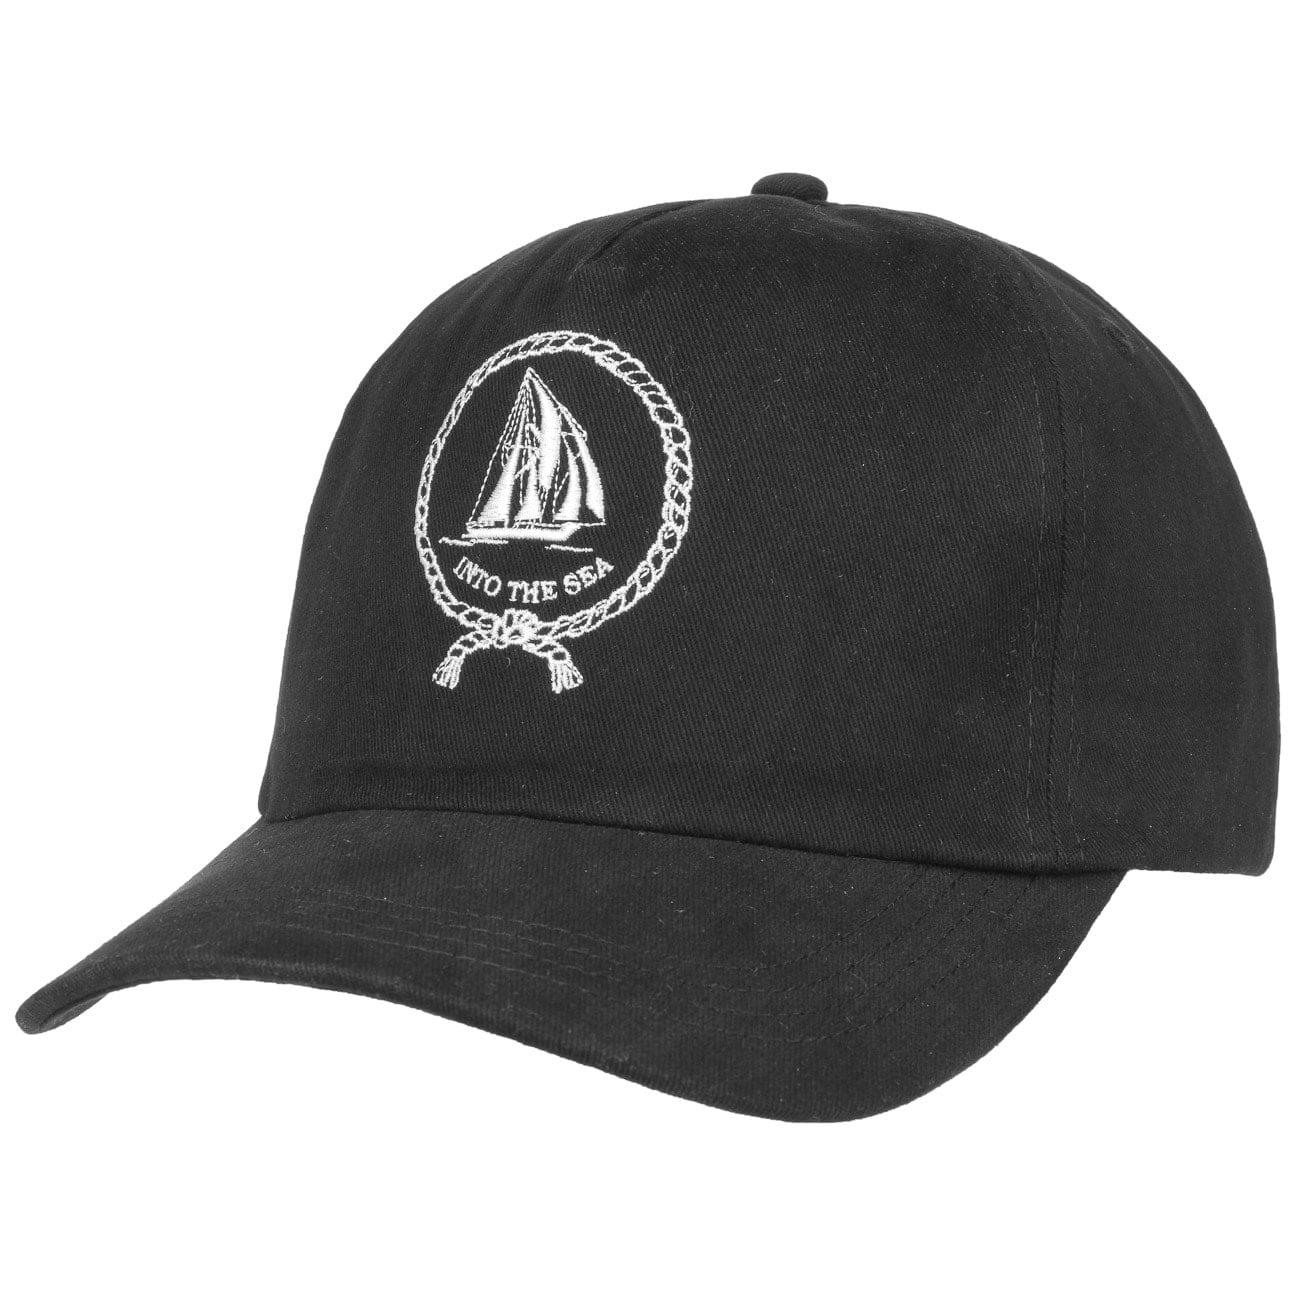 Casquette Strapback Shipmate by Captain Fin  baseball cap